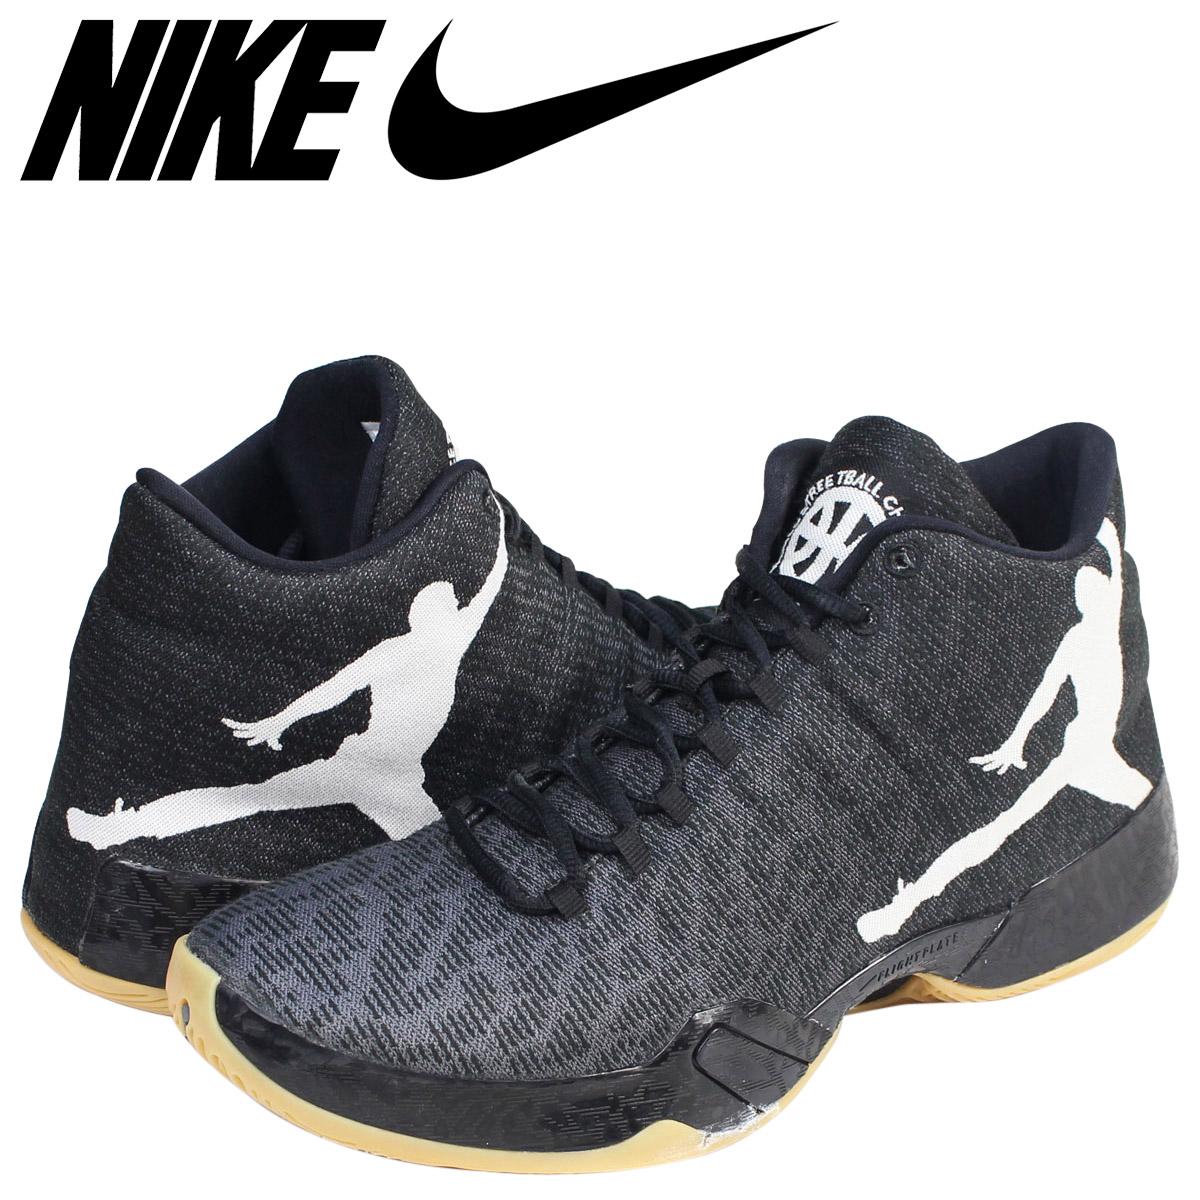 wholesale dealer 1a474 df079 NIKE Nike Air Jordan 29 sneakers AIR JORDAN XX9 QUAI 54 805,254-004 men's  shoes black